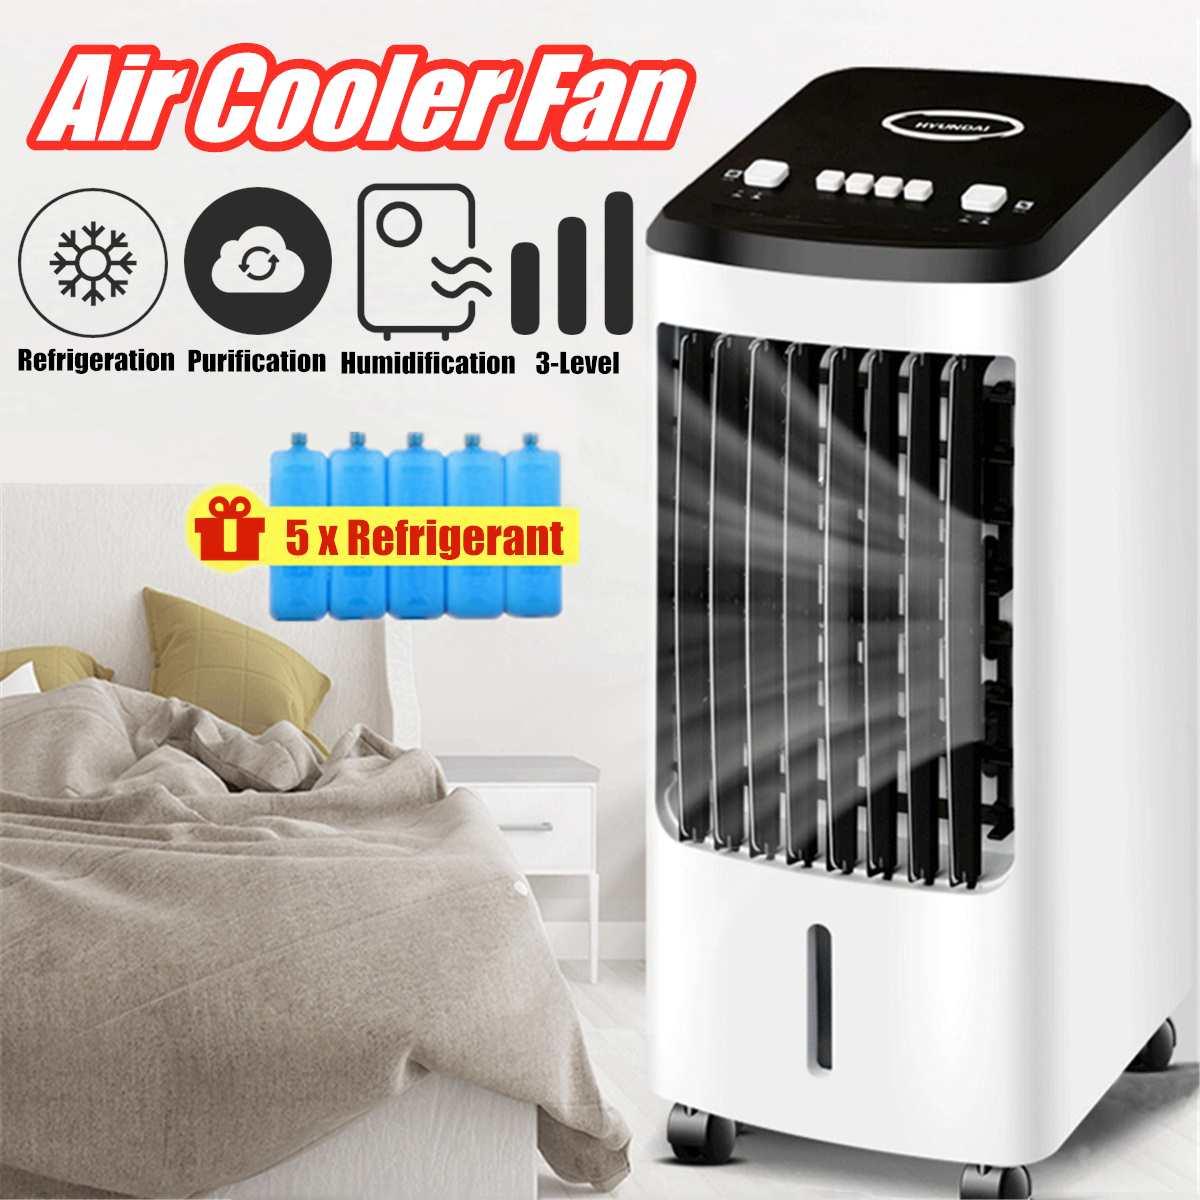 Portable Air Conditioner Conditioning Fan Humidifier Cooler Cooling 70W 220V Air Conditioner Timed Cooling Fan Humidifier+Gift